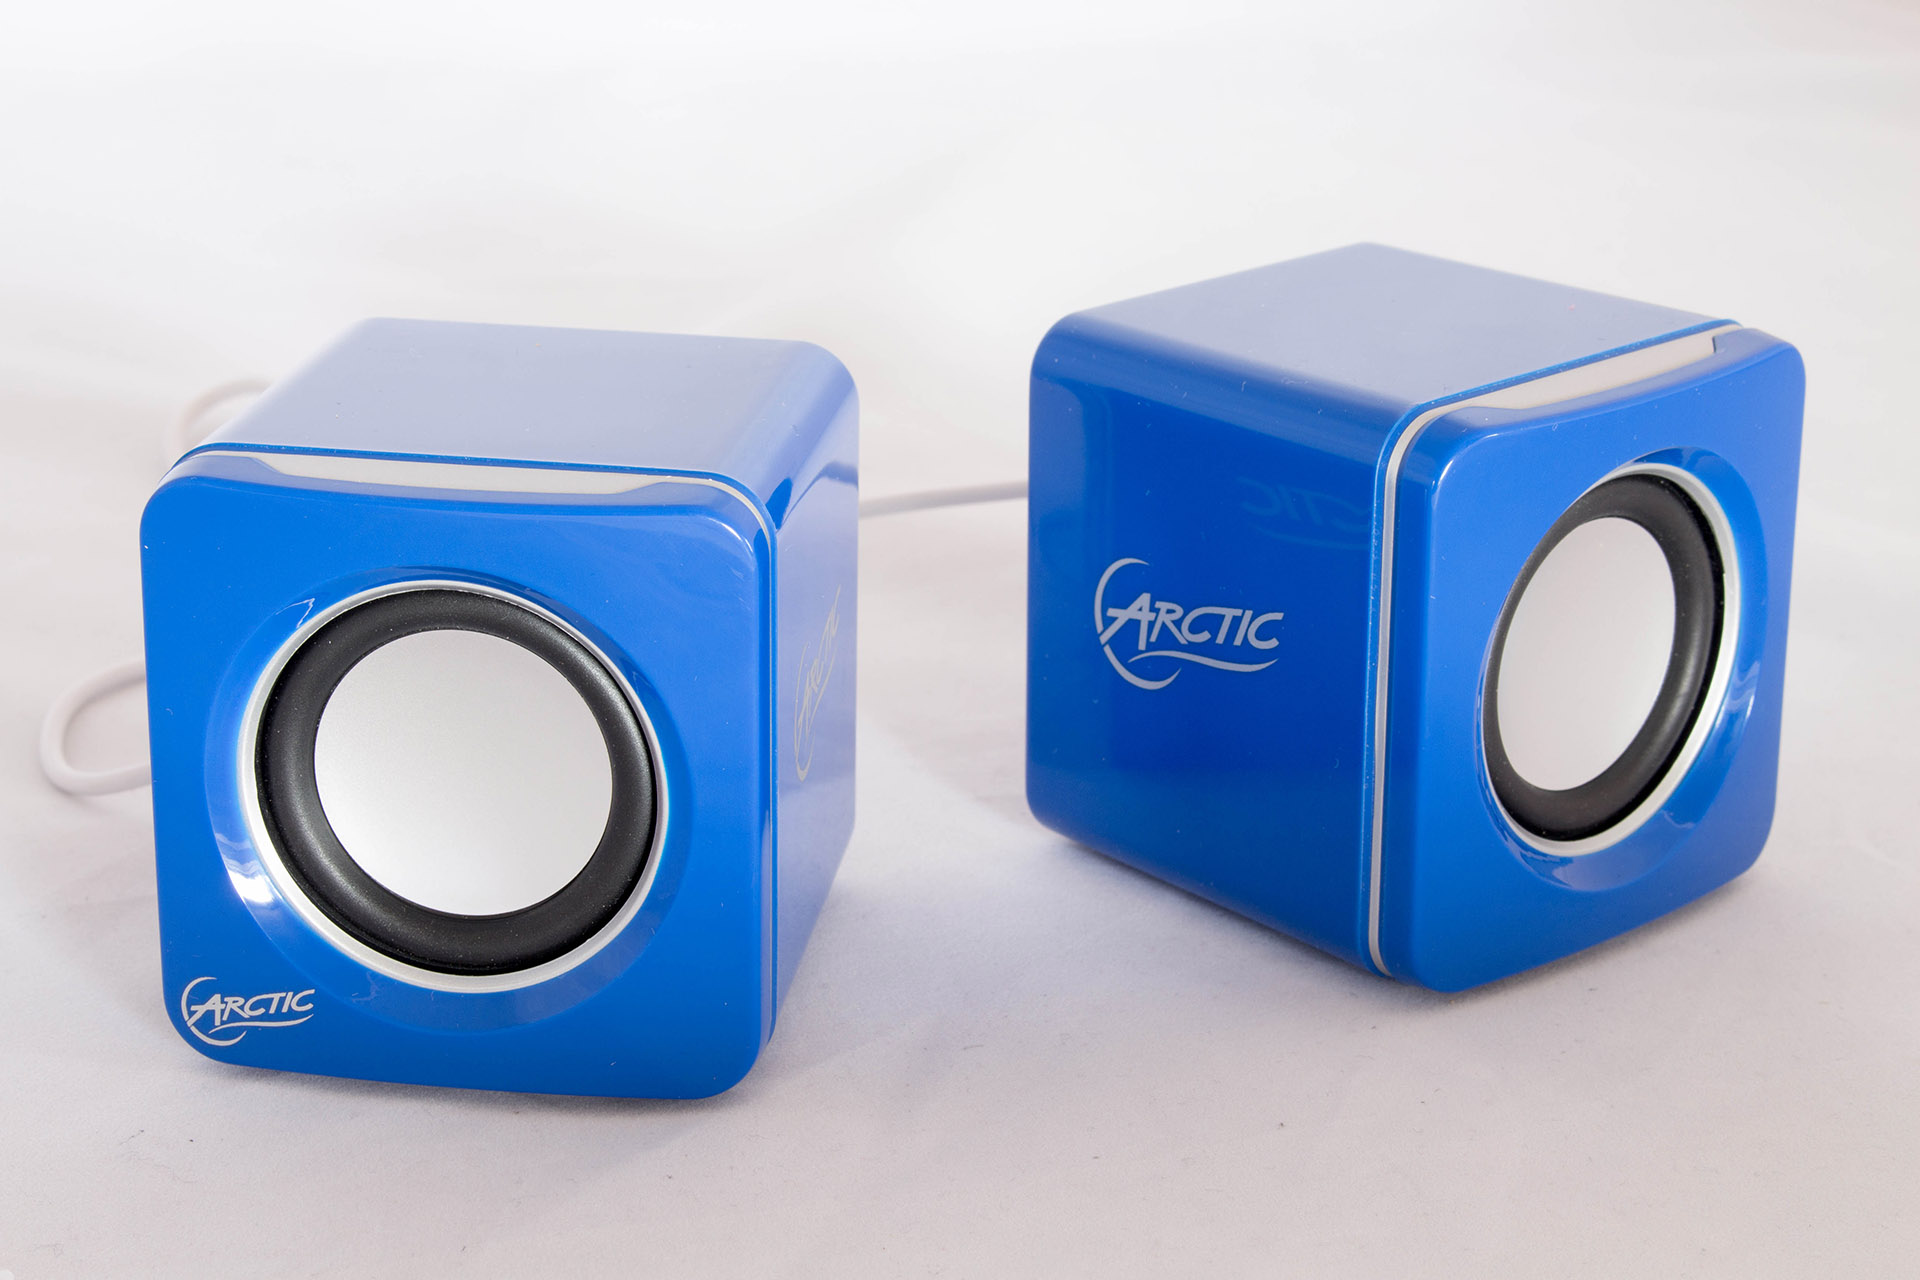 Arctic S111 BT Sound System